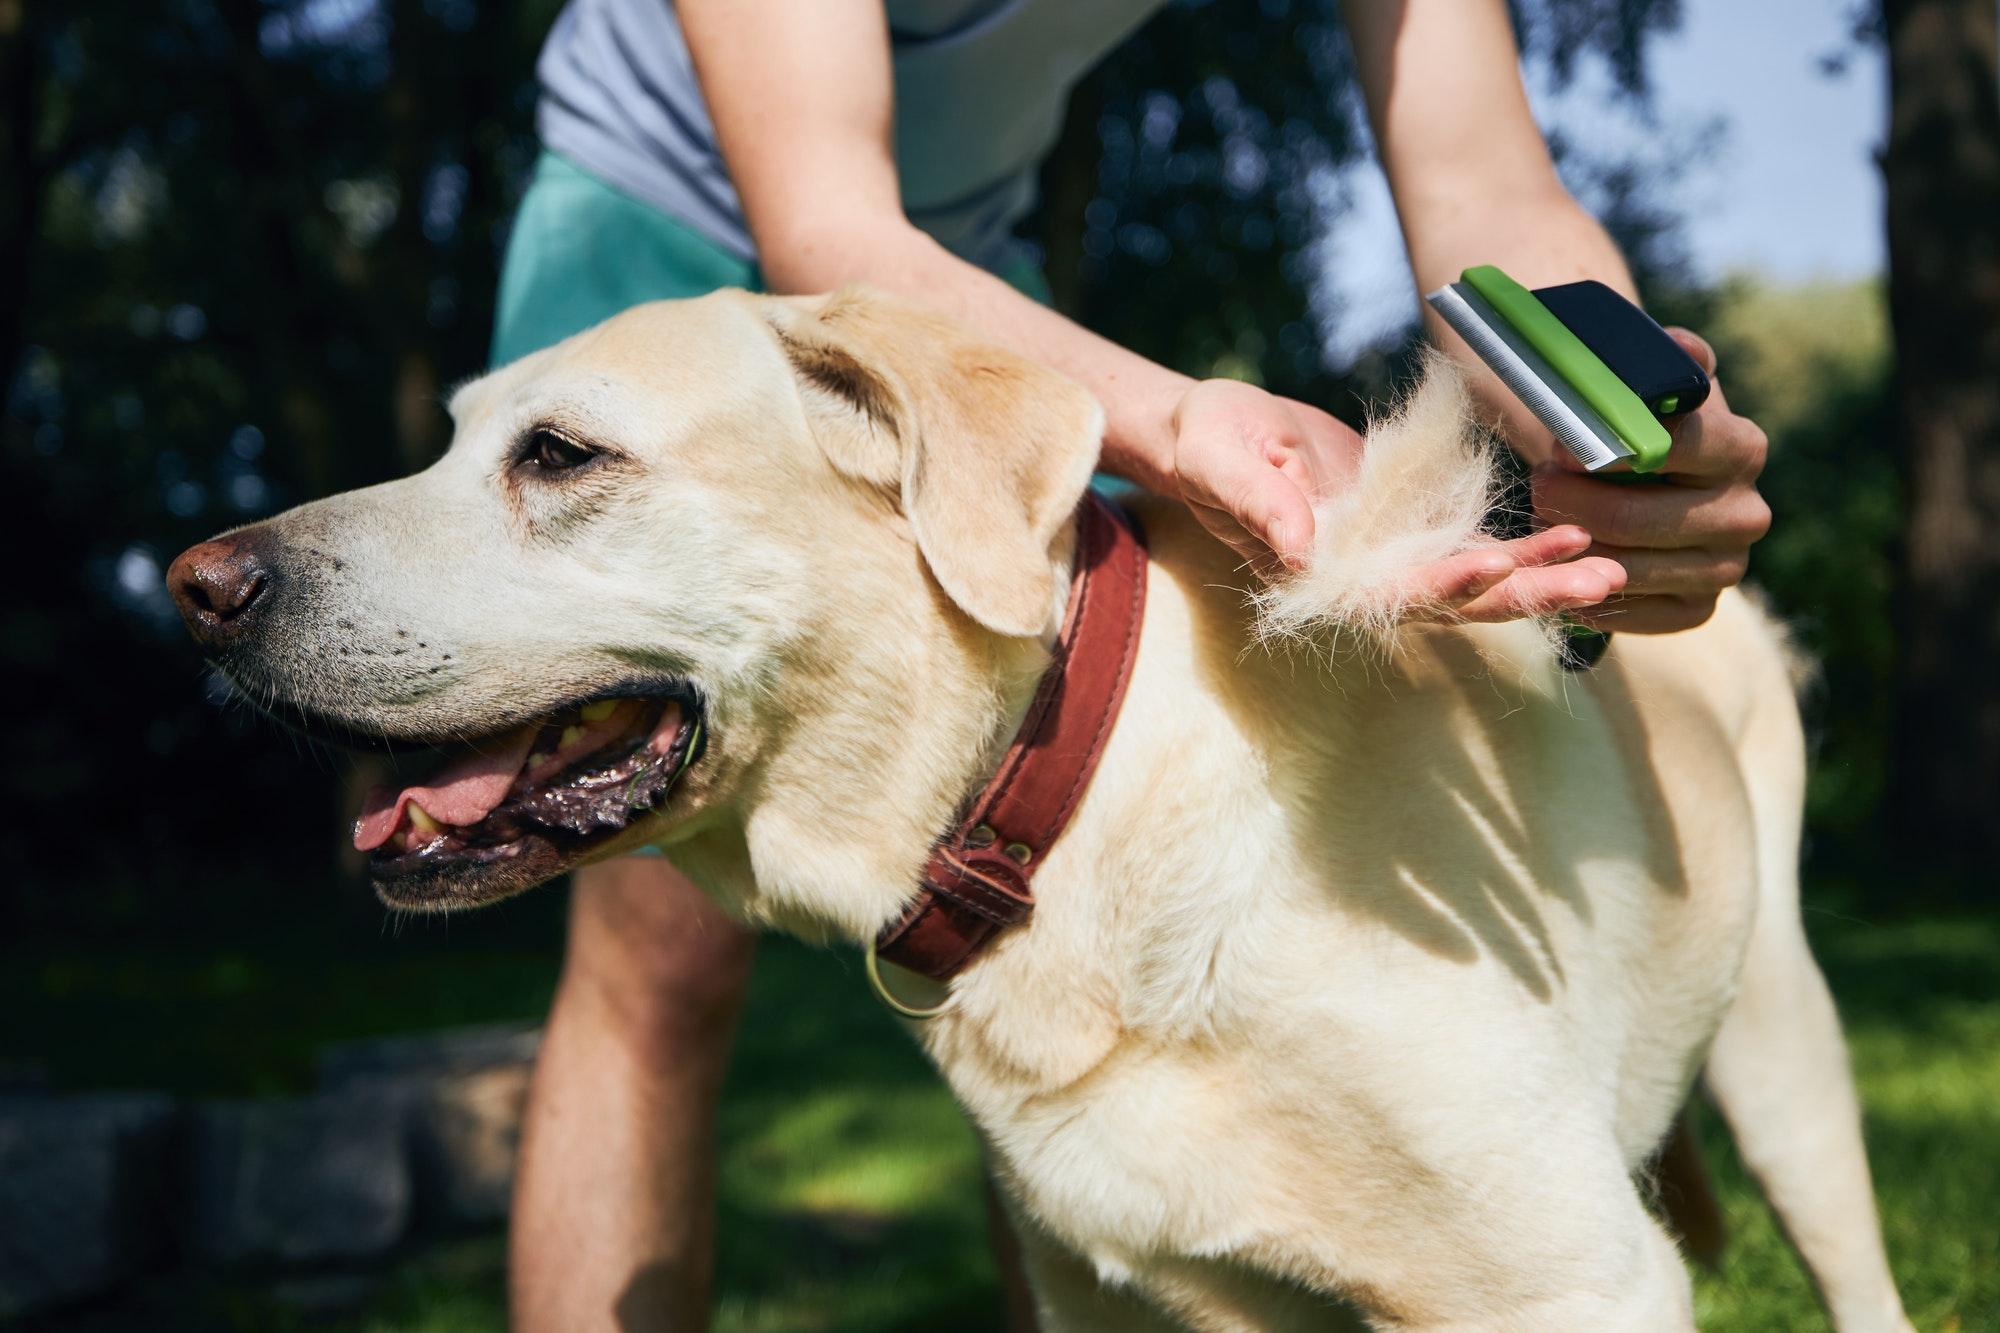 Pet owner is brushing fur of his dog